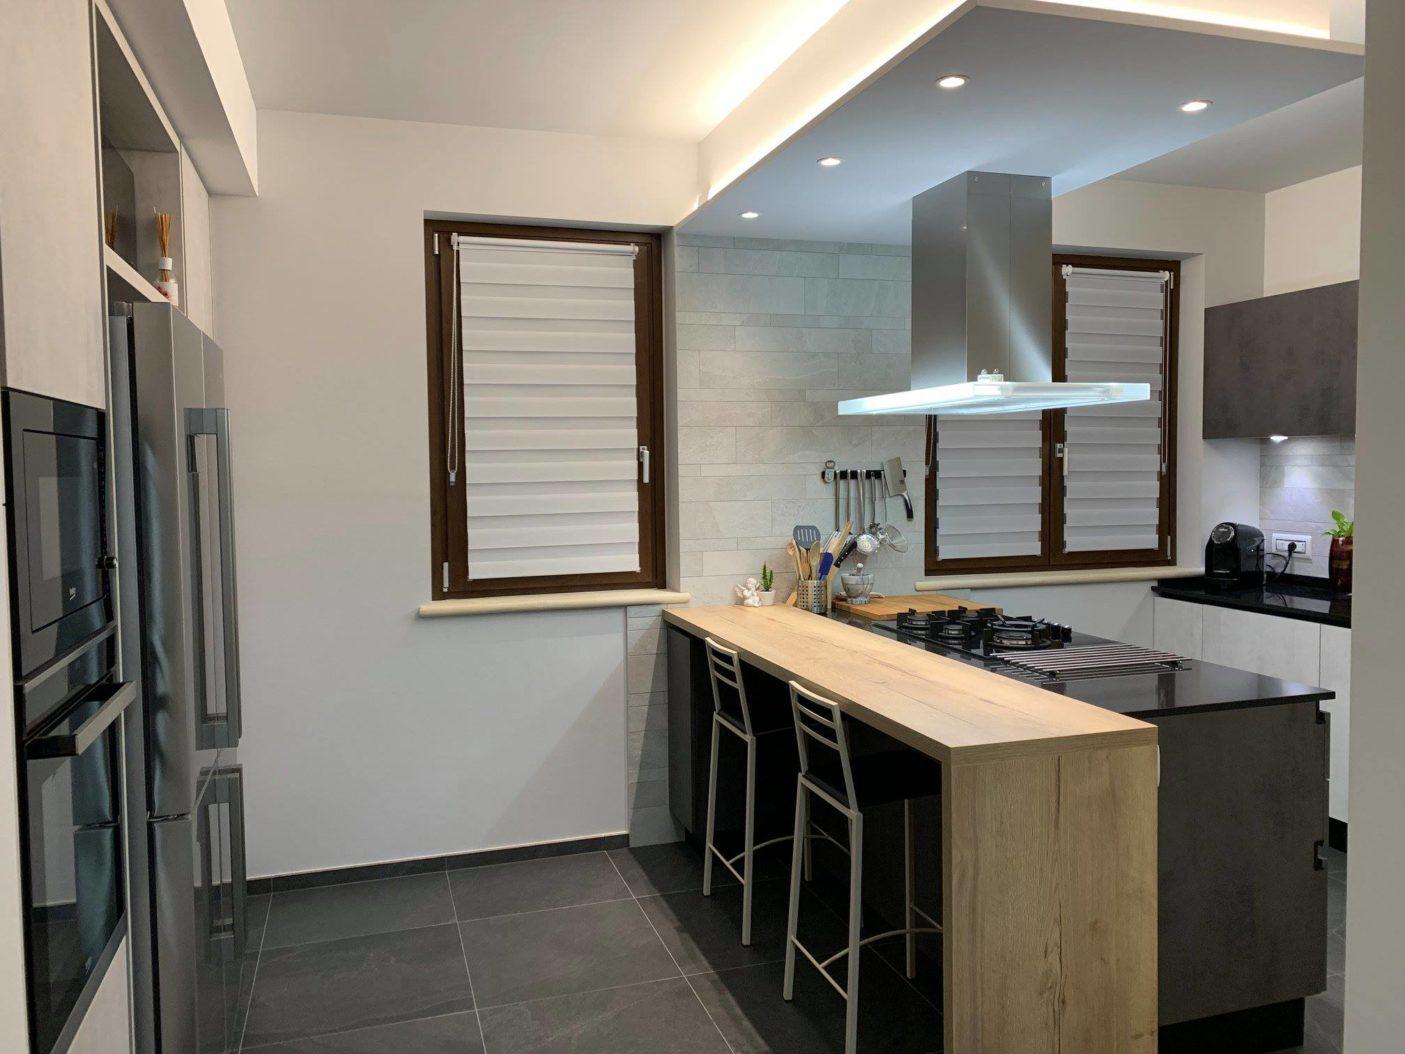 Cucina-Creo-Kitchens-Tablet-Personalizzata3-1.jpg